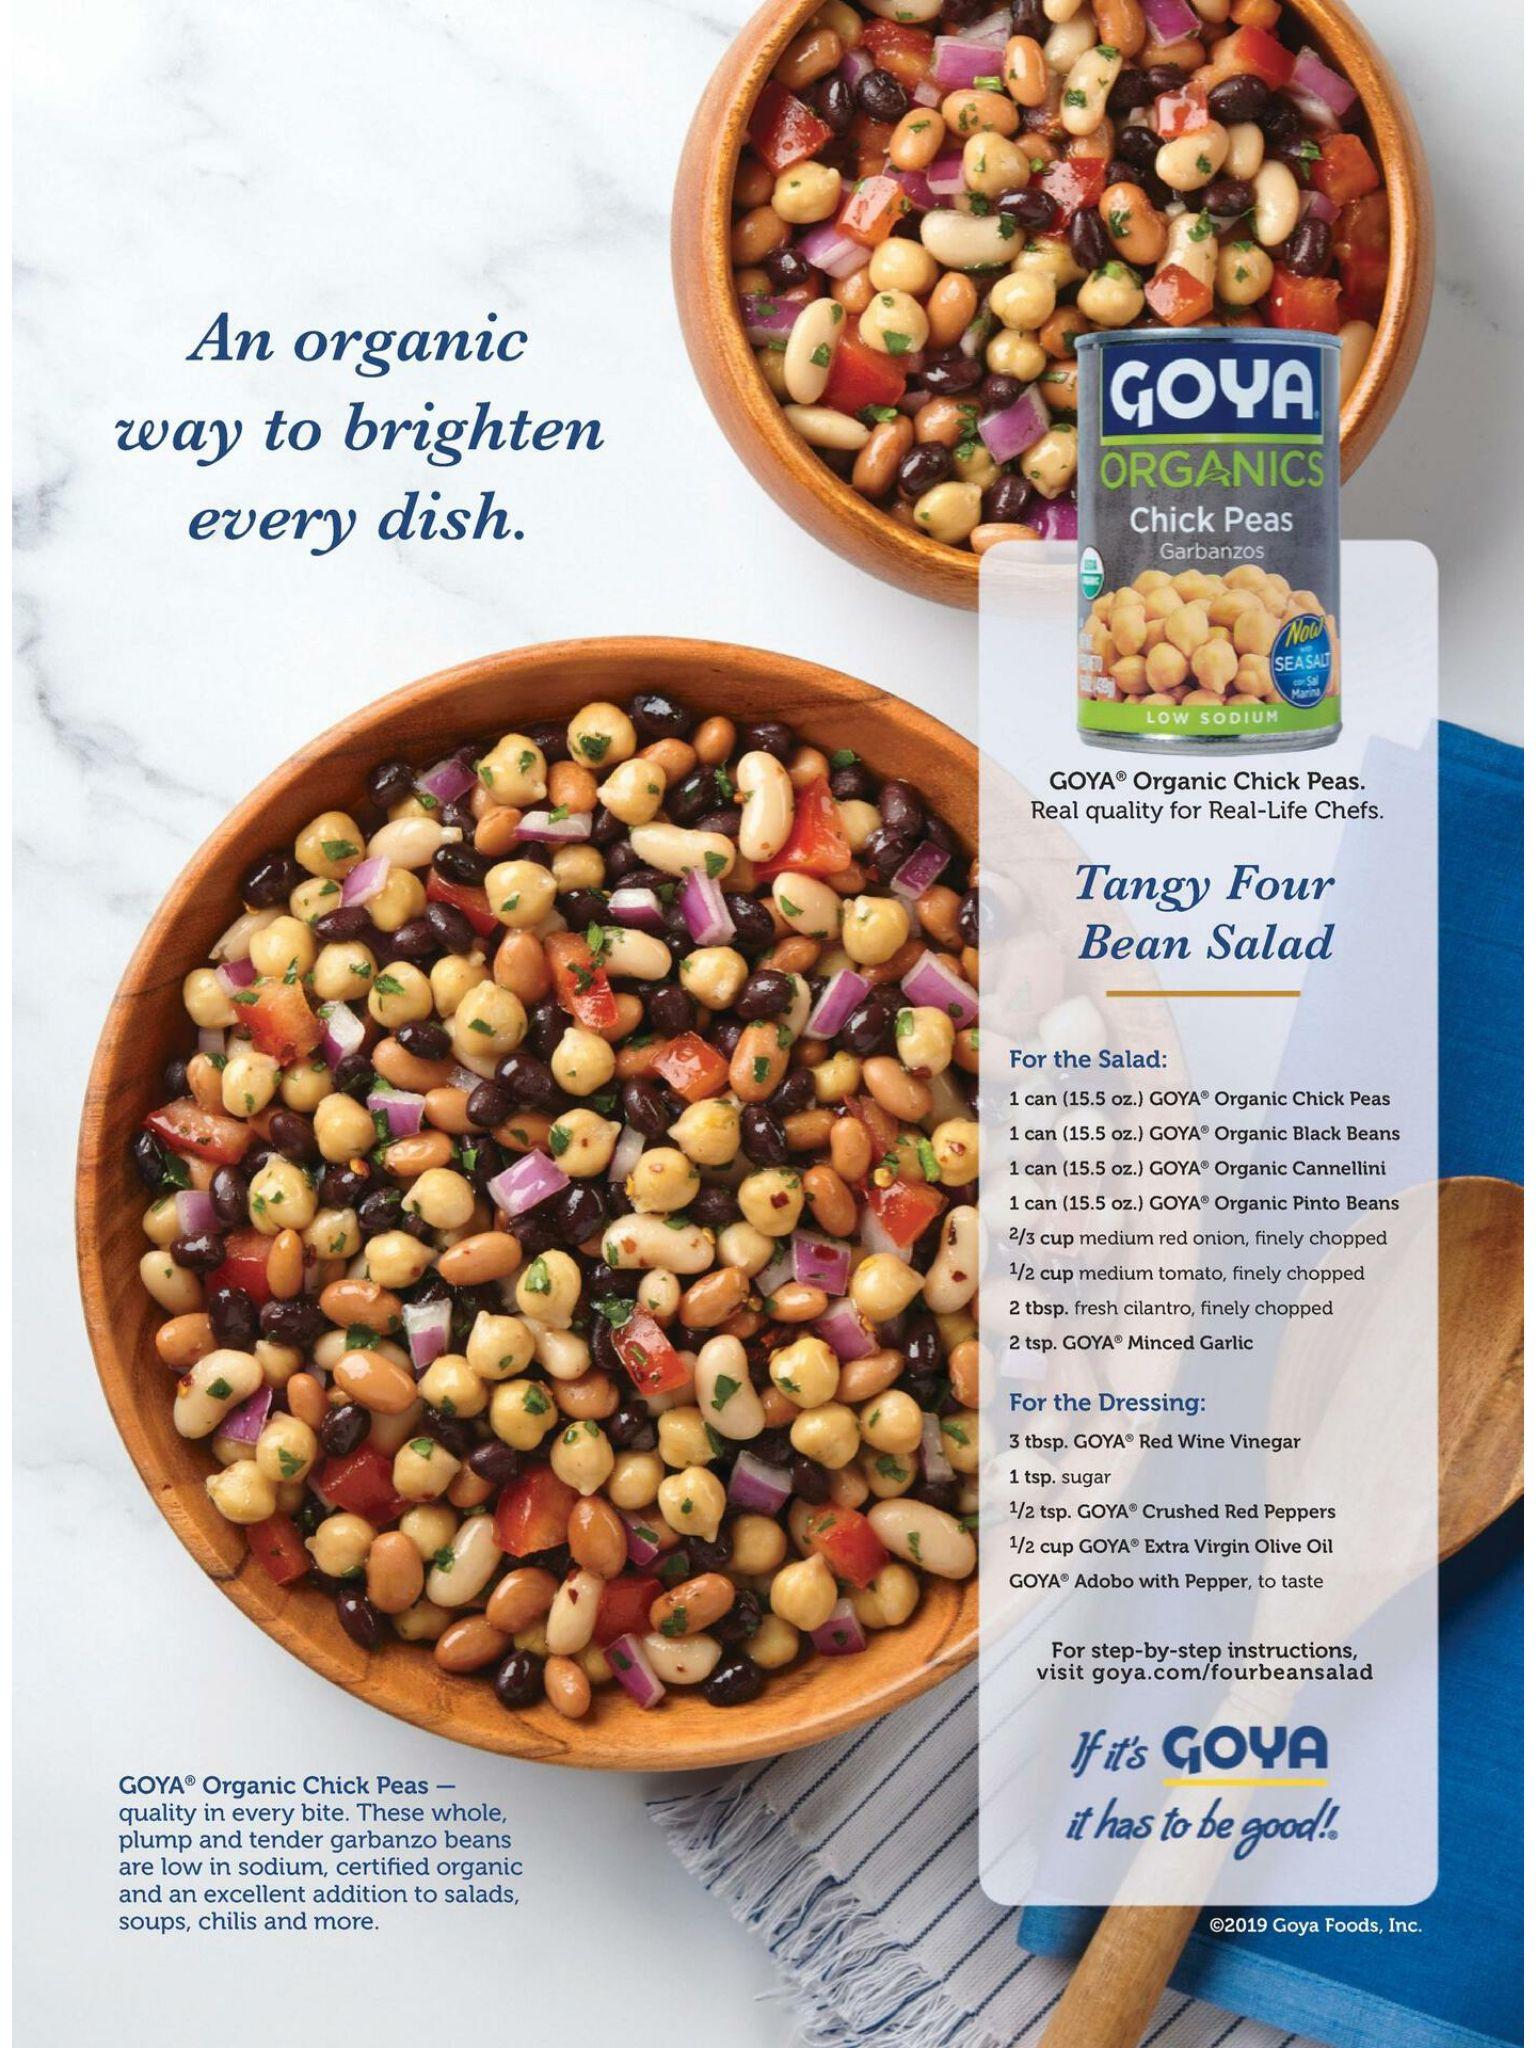 Pin By Sylvia Herrera On Summer Food In 2020 Food Dog Food Recipes Four Bean Salad